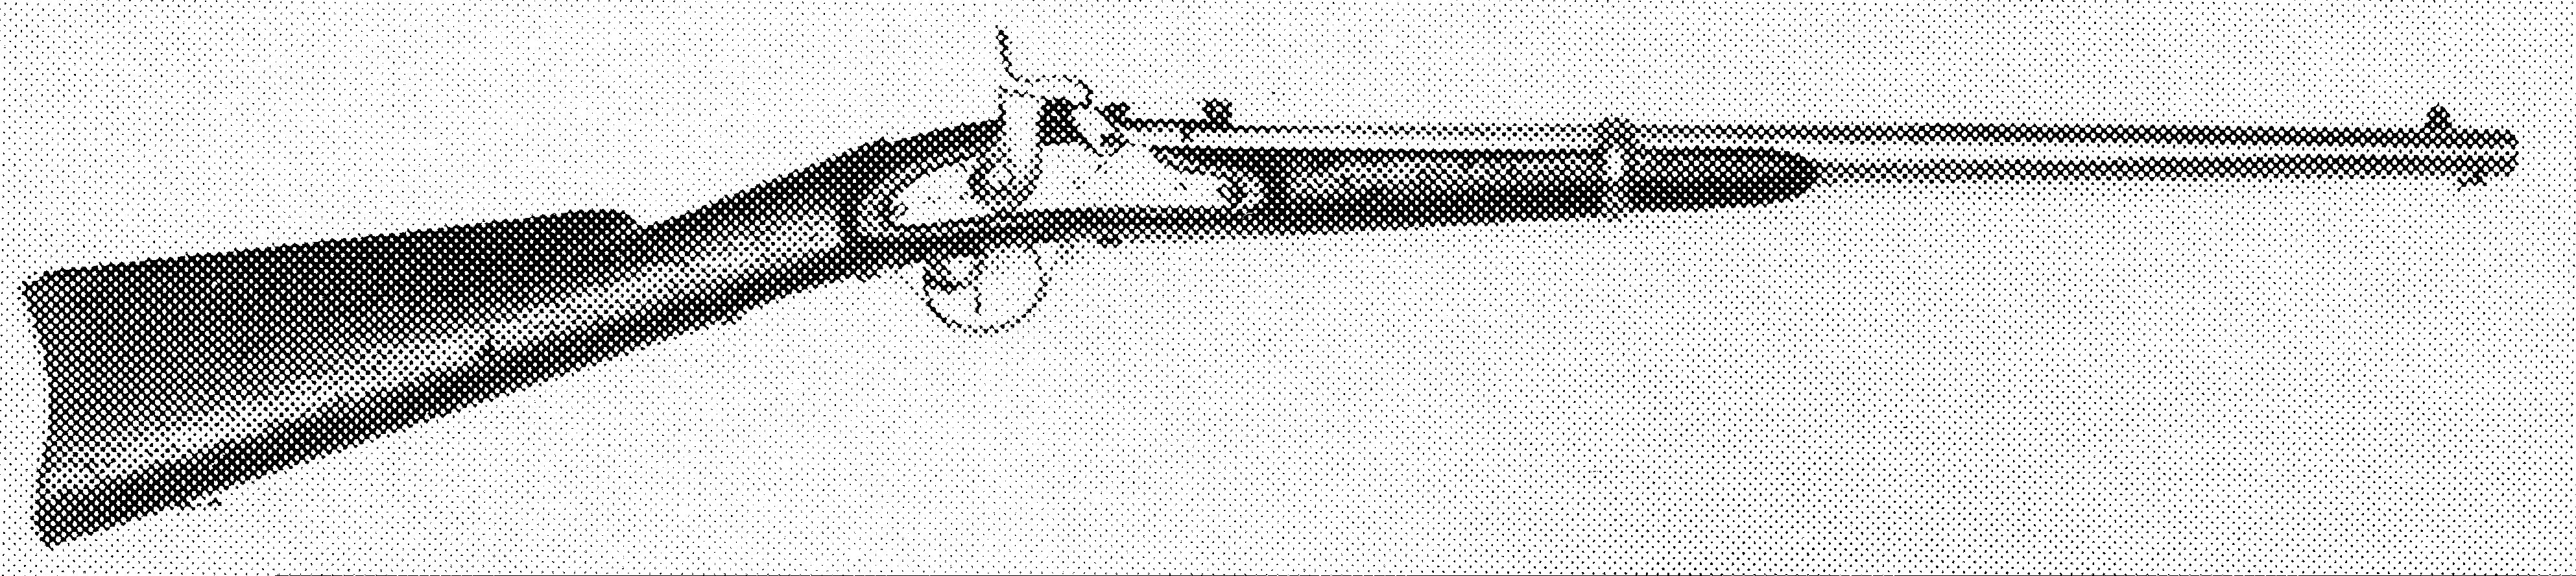 2nd Type